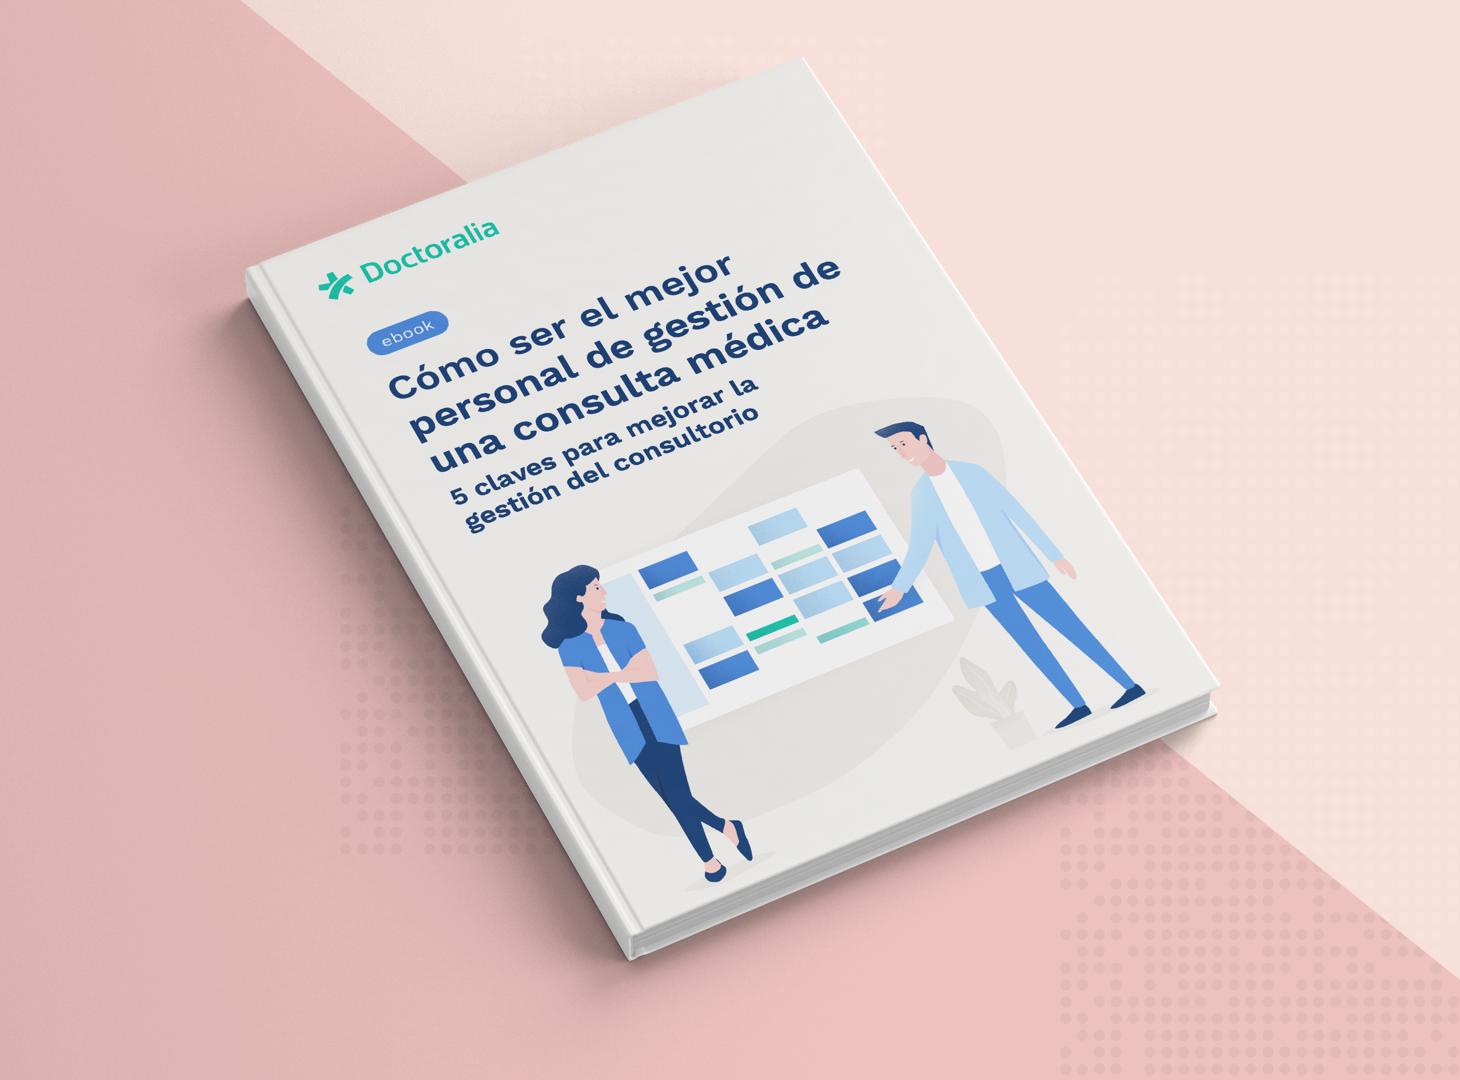 shareable-es-ebook-gestionar-consulta-mockup-bg-pink-1